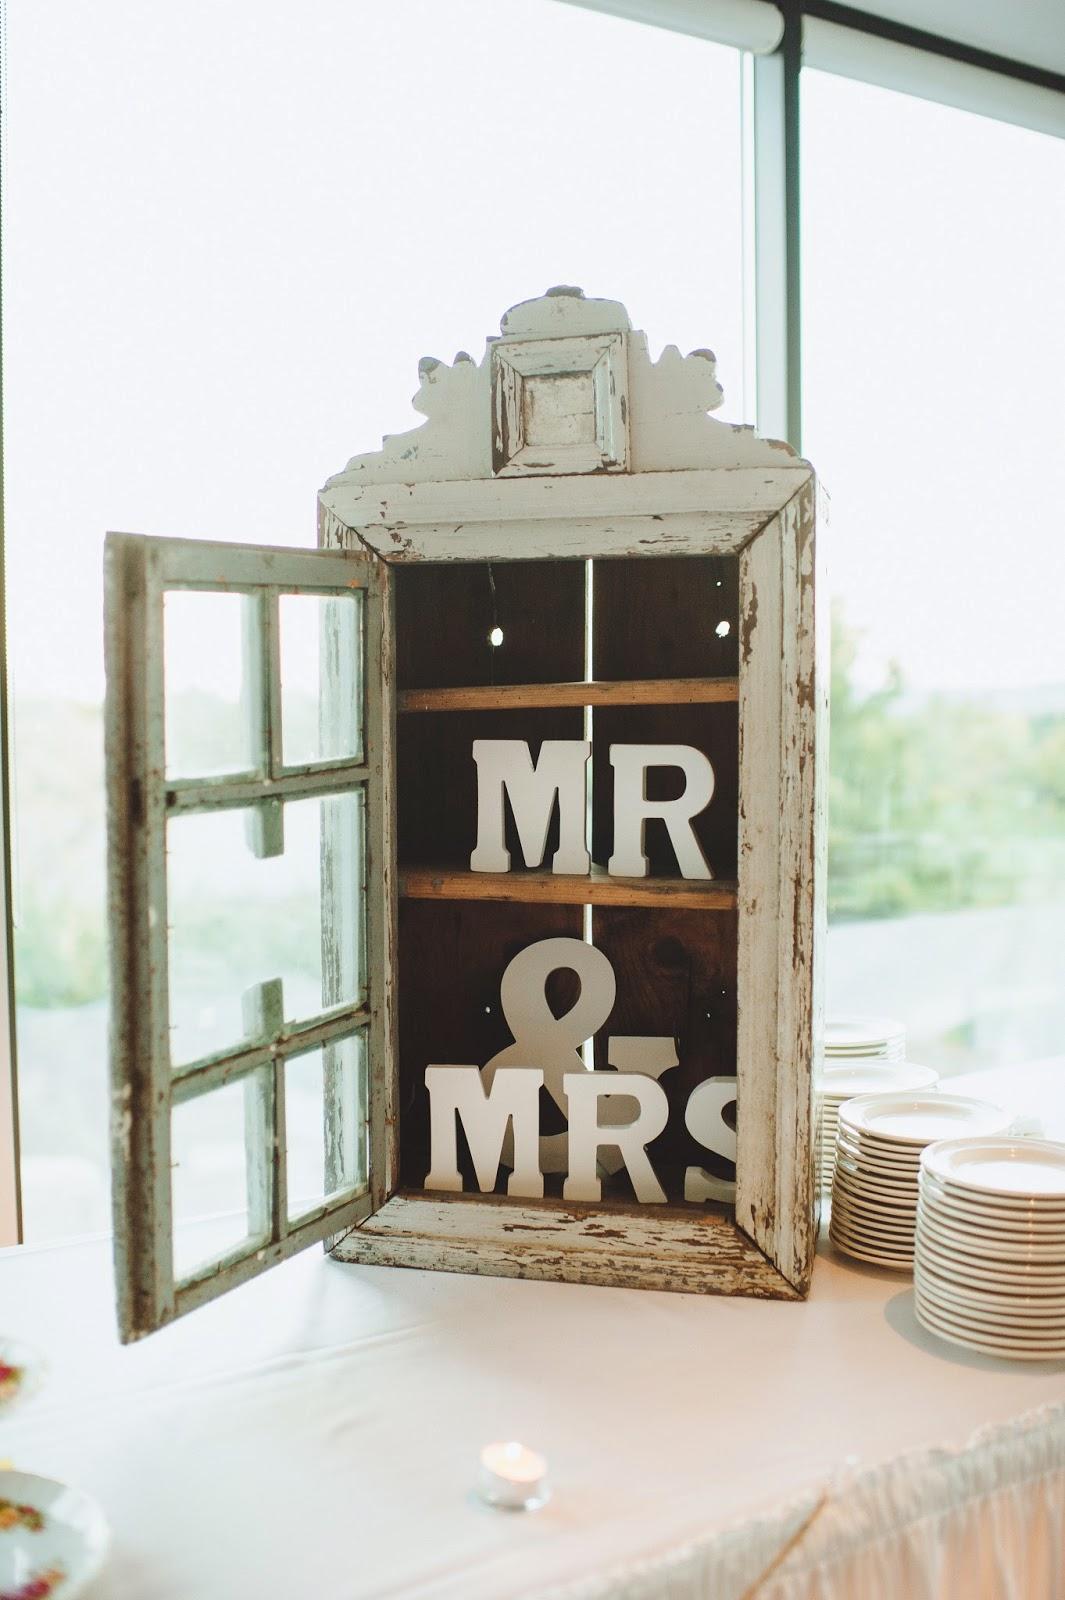 dundas golf and curling club wedding photo kj and co vintage rentals hamilton wedding planner